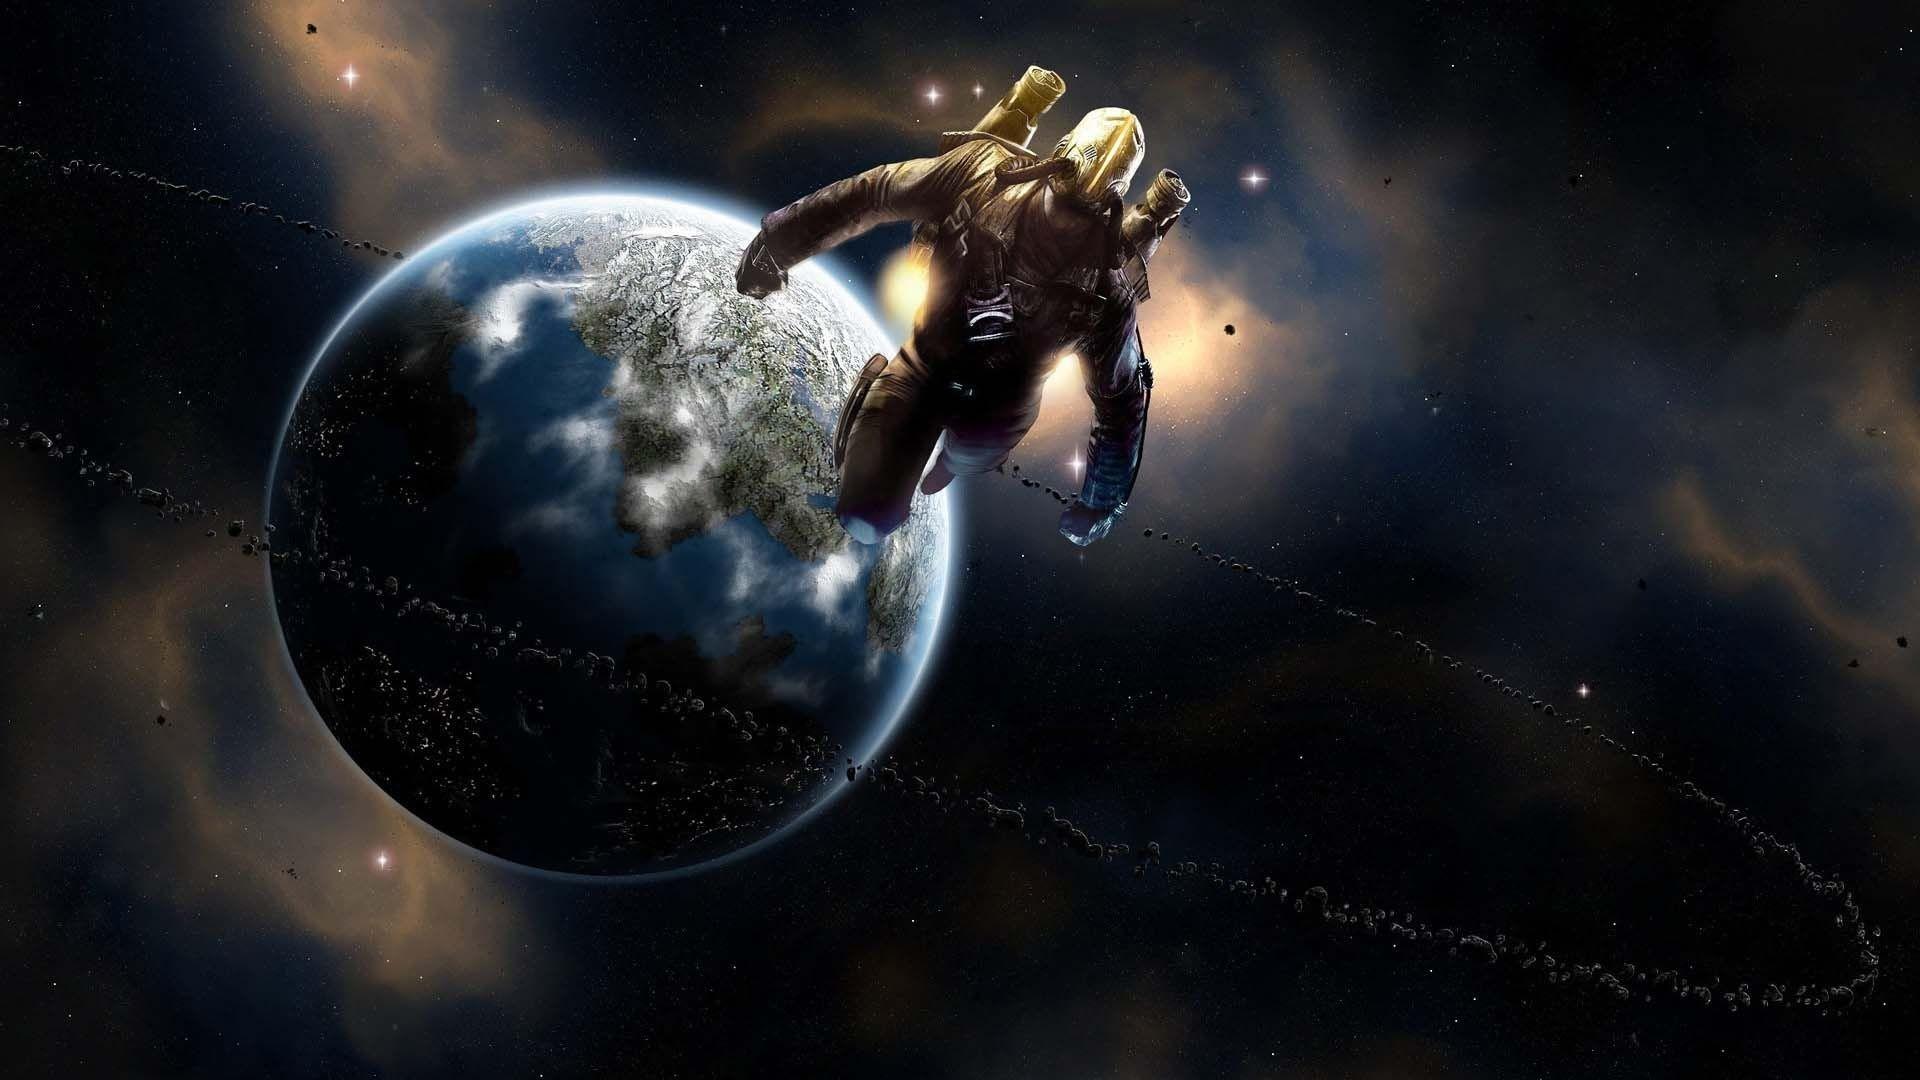 Res: 1920x1080, Spaceman In Universe | HD Digital Universe Wallpaper Free Download ...